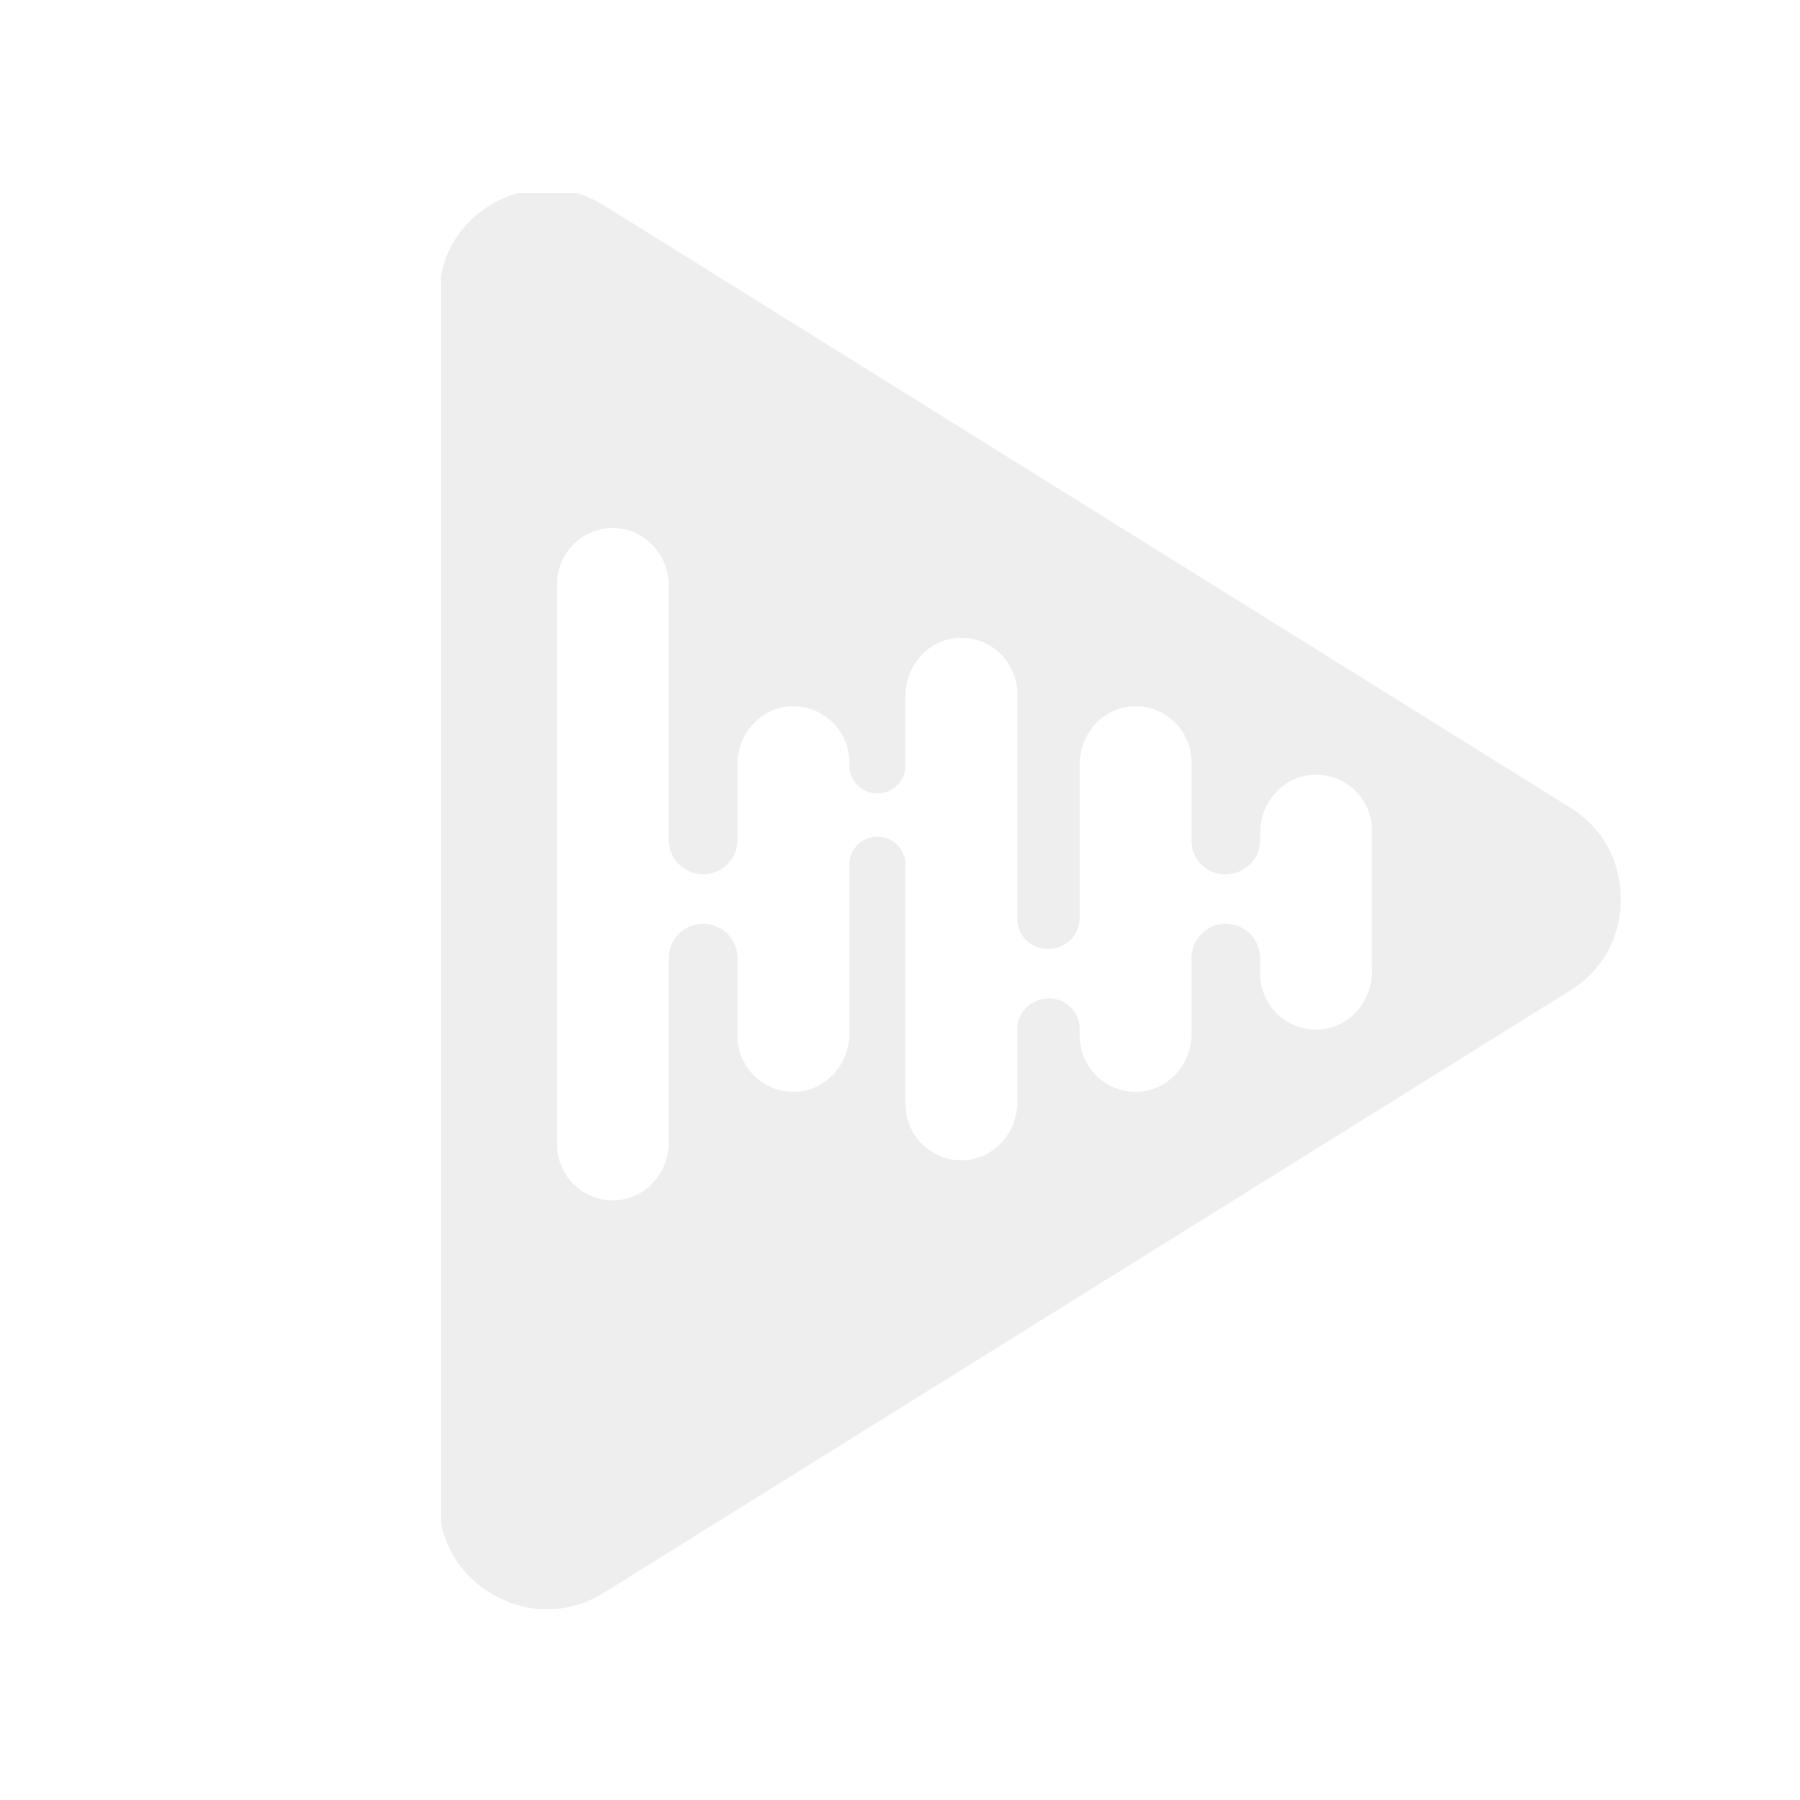 Skoddejuice Gin Aroma